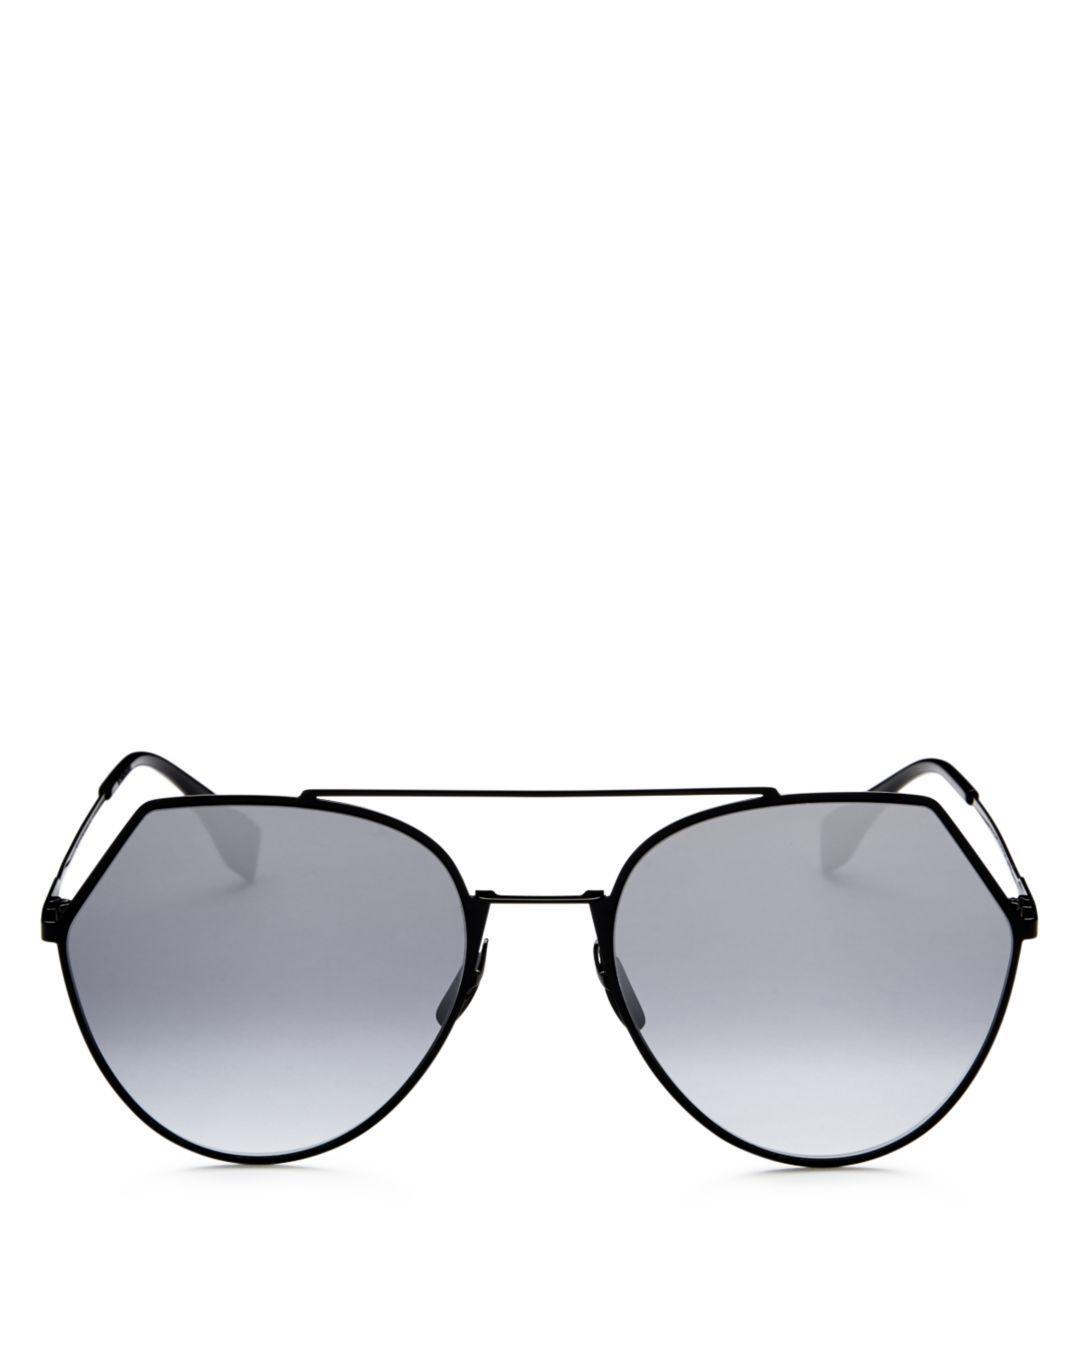 314748de12df0 Fendi Eyeline 0194 Aviator Sunglasses in Black - Save 22% - Lyst